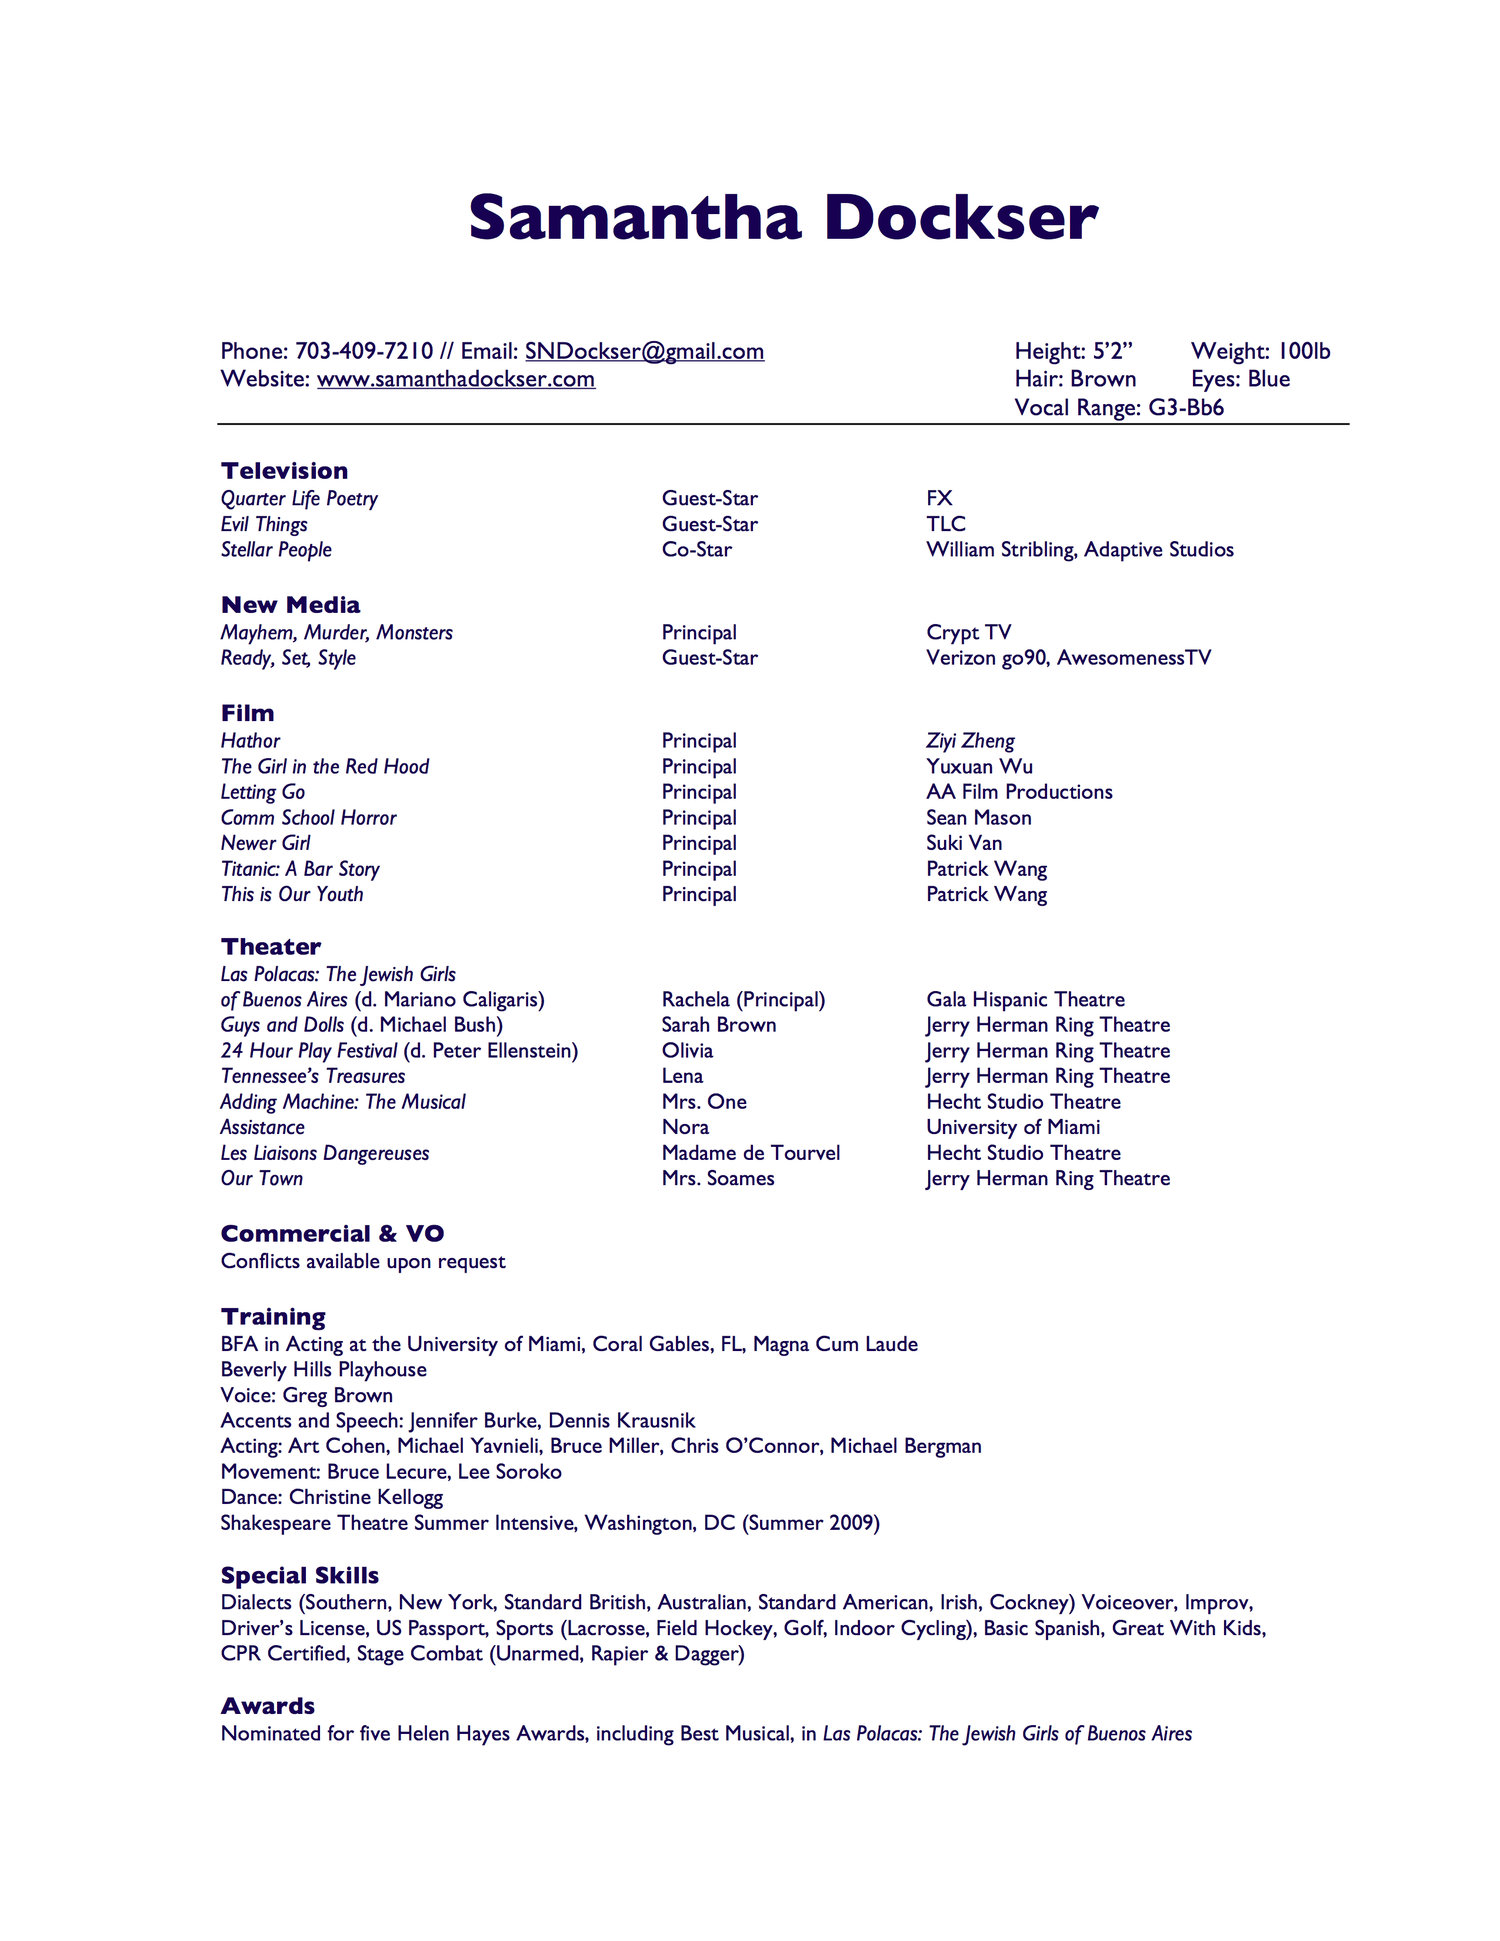 resume samantha dockser